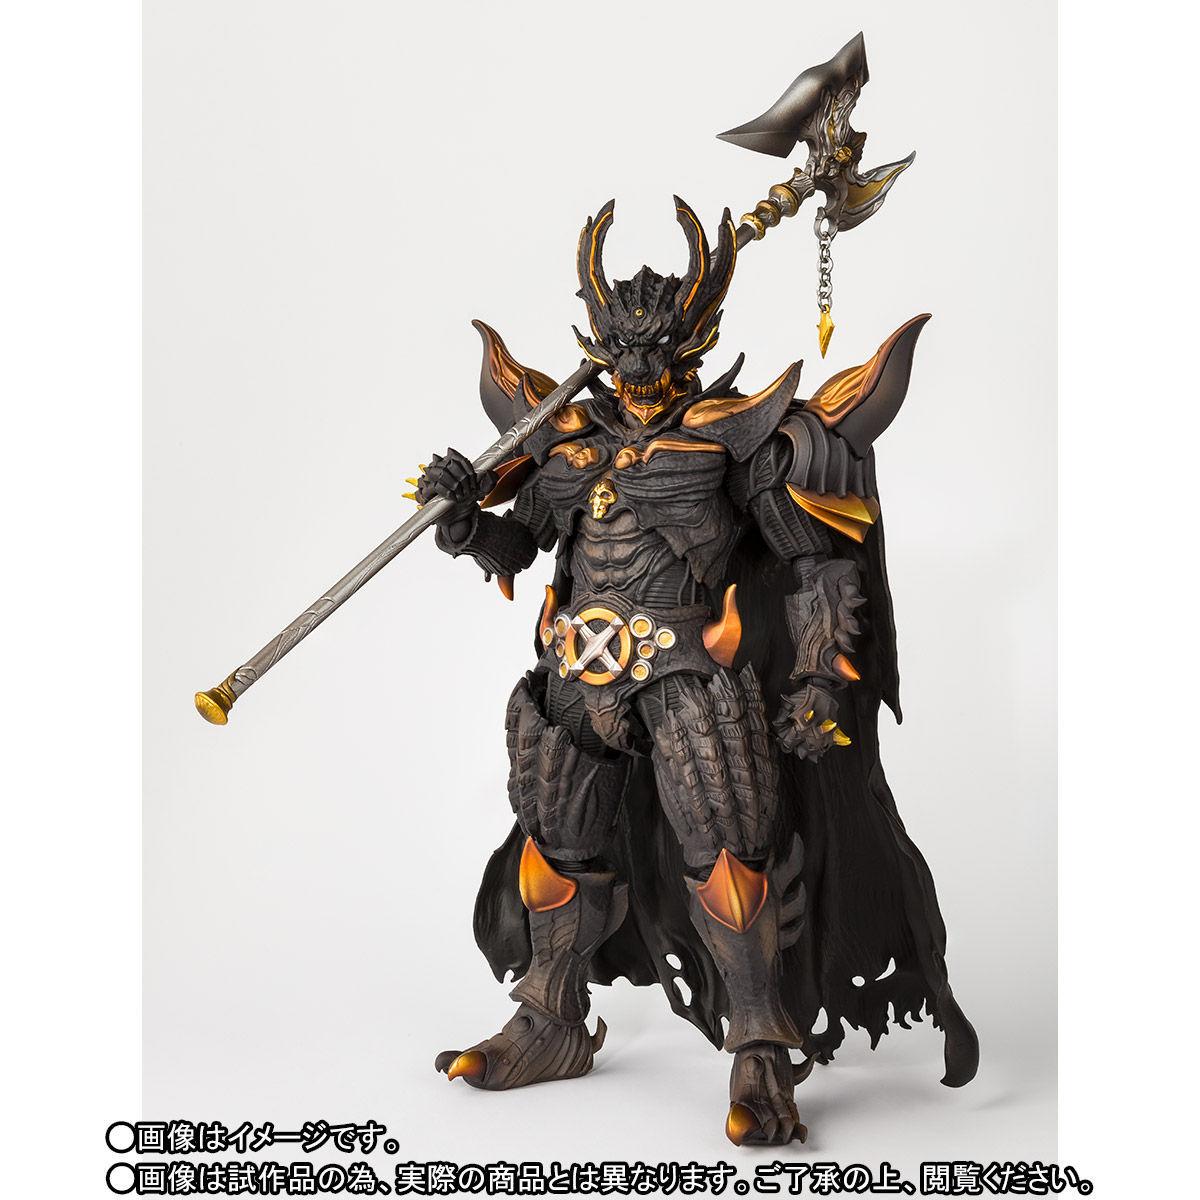 Figuarts(真骨彫製法) 暗黒騎士キバ予約7